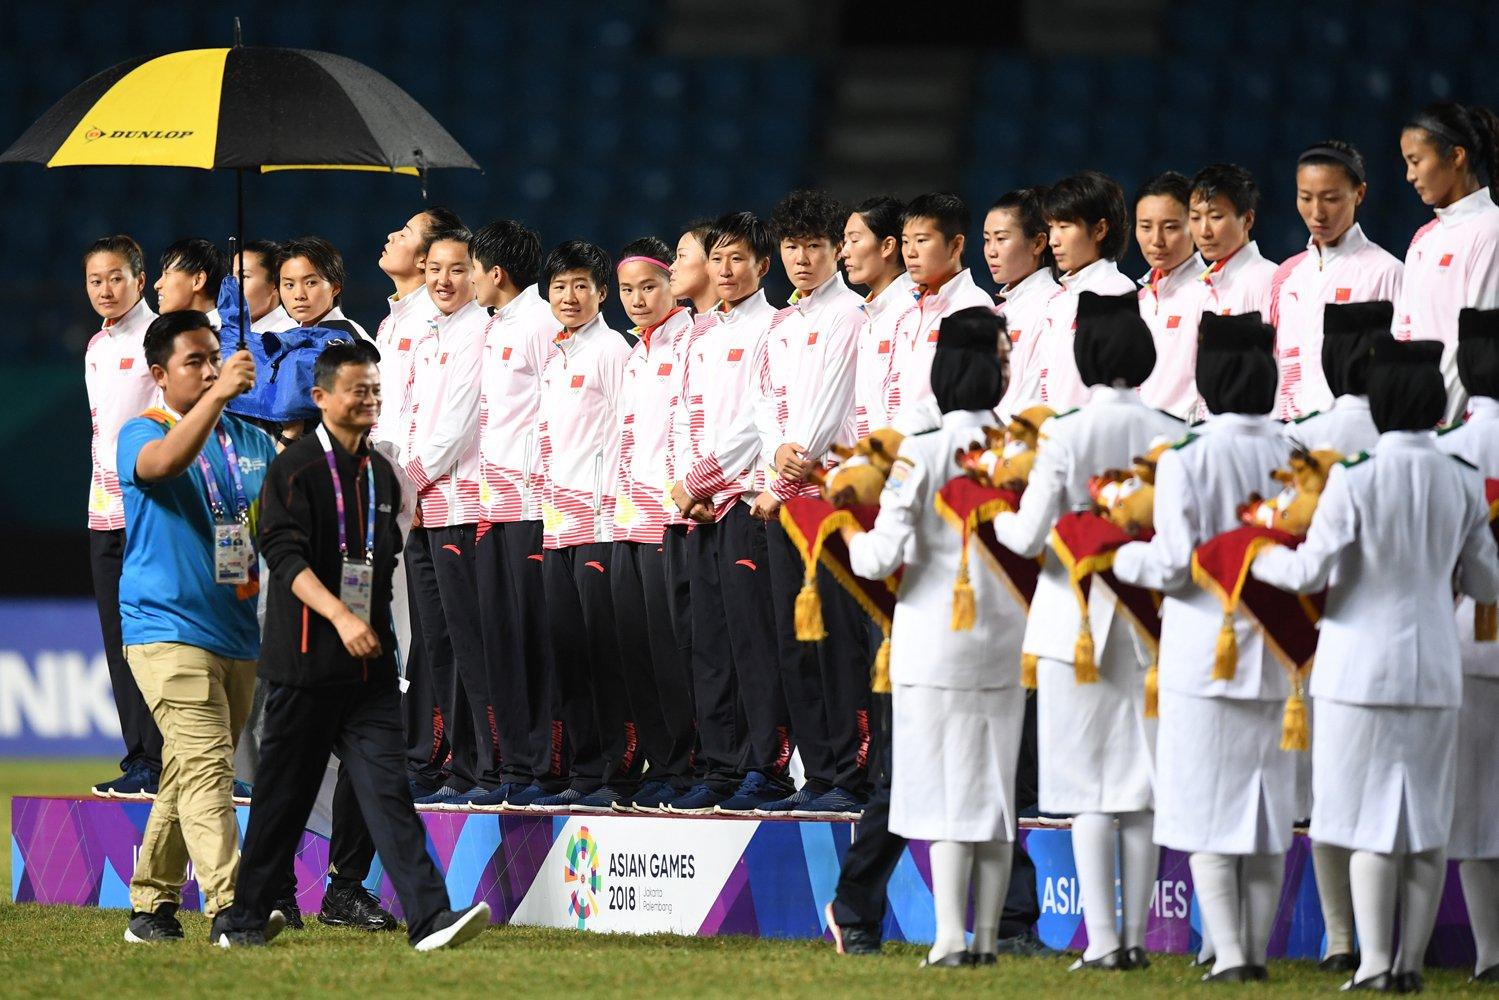 Executive Chairman Alibaba Group Jack Ma (kedua kiri) berjalan menuju podium untuk memberi boneka maskot Asian Games 2018 pada tim sepak bola wanita Cina saat pemberian medali kejuaraan sepak bola wanita Asian Games 2018 di Stadion Gelora Sriwijaya Jakabaring, Palembang, Sumatera Selatan, Jumat (31/8). Jepang menang atas Cina dengan skor 1-0 dan memastikan Jepang merah medali emas disusul Cina dengan medali perak dan Korea Selatan medali perungu.